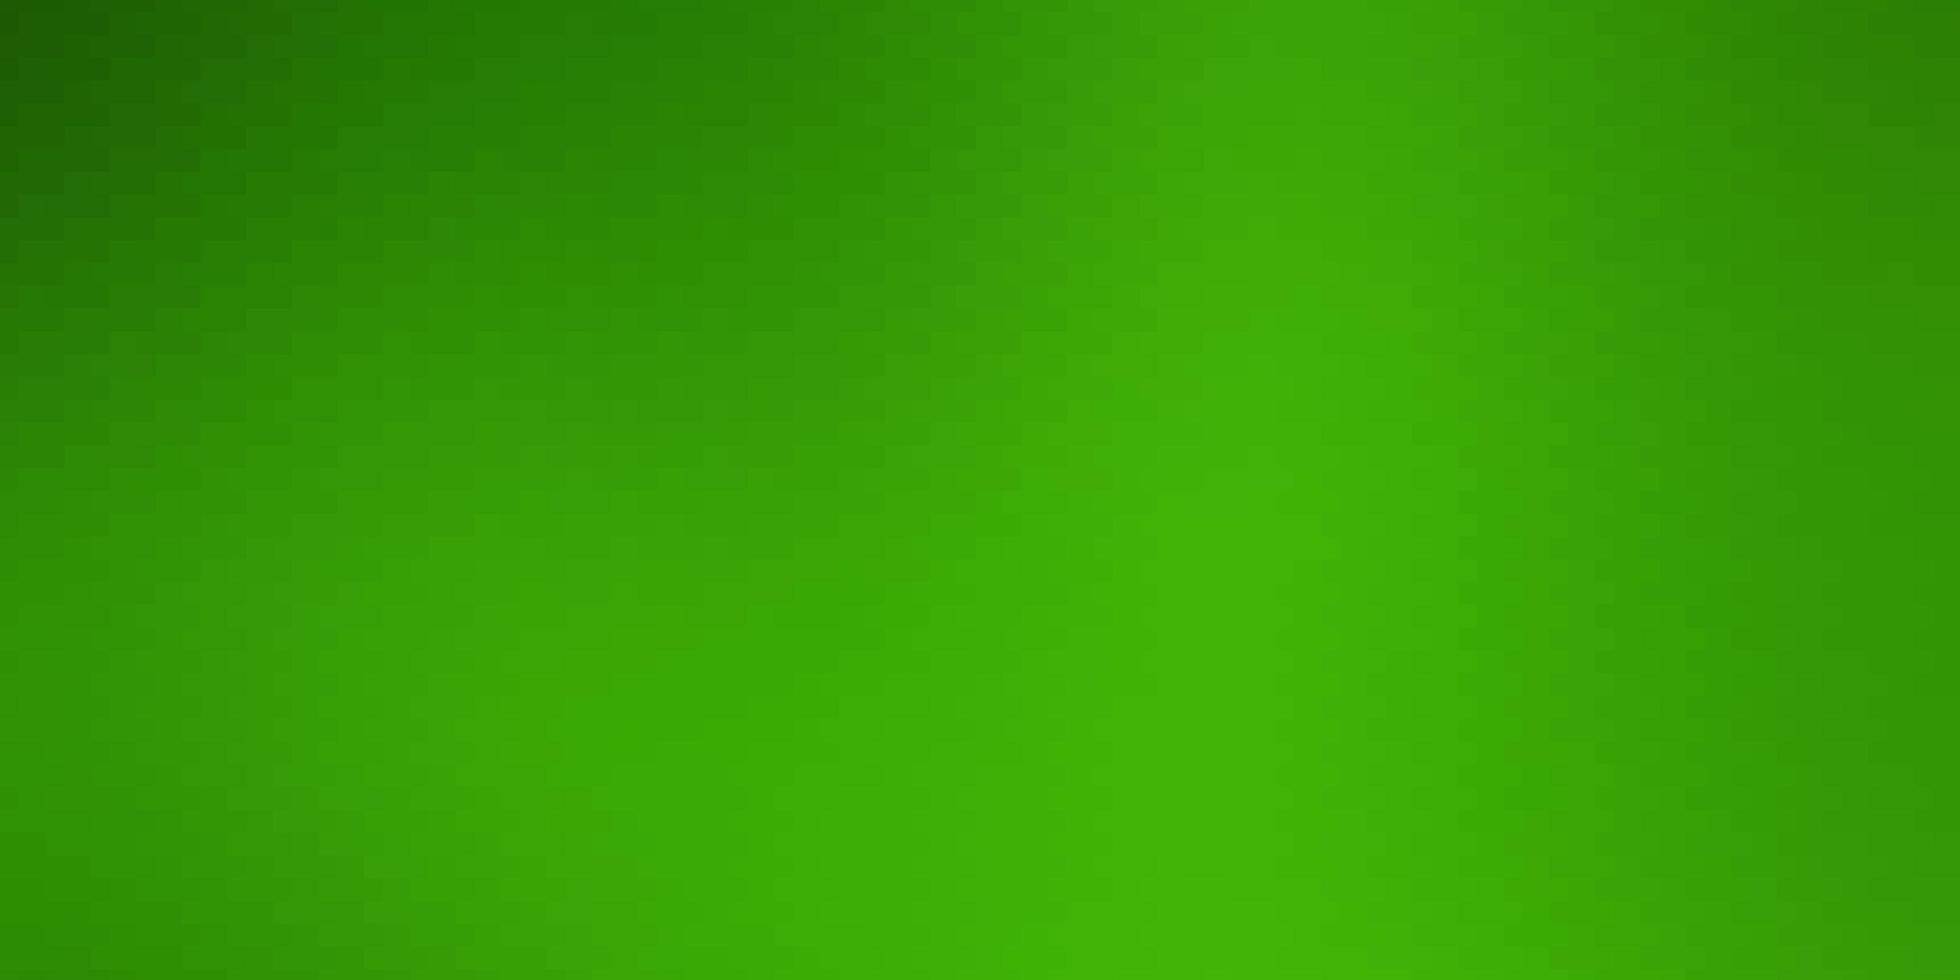 ljusgrön bakgrund i polygonal stil. vektor